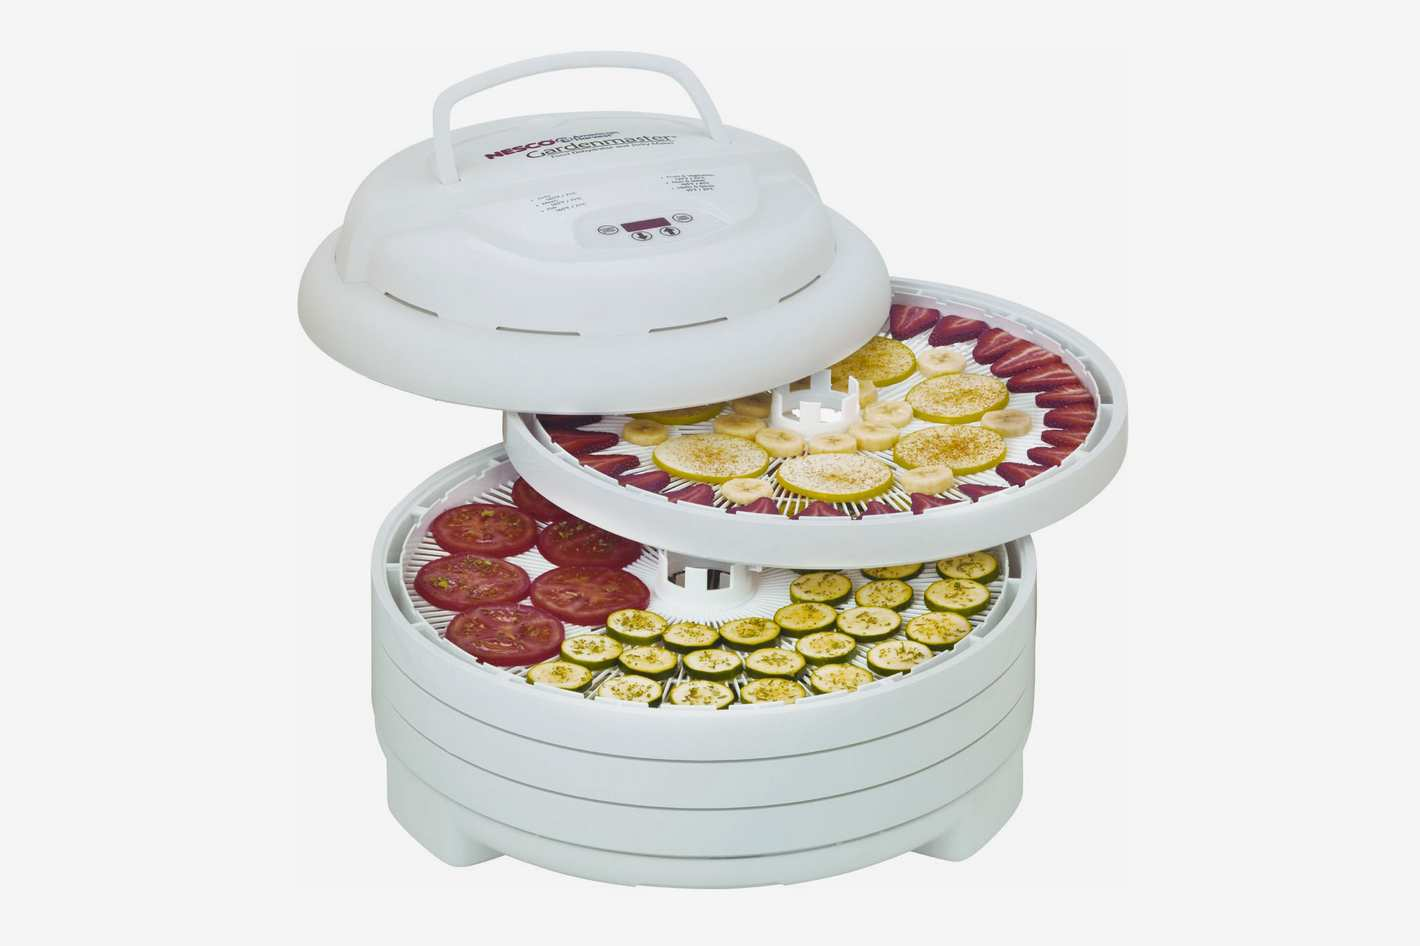 NESCO FD-1040, Gardenmaster Food Dehydrator